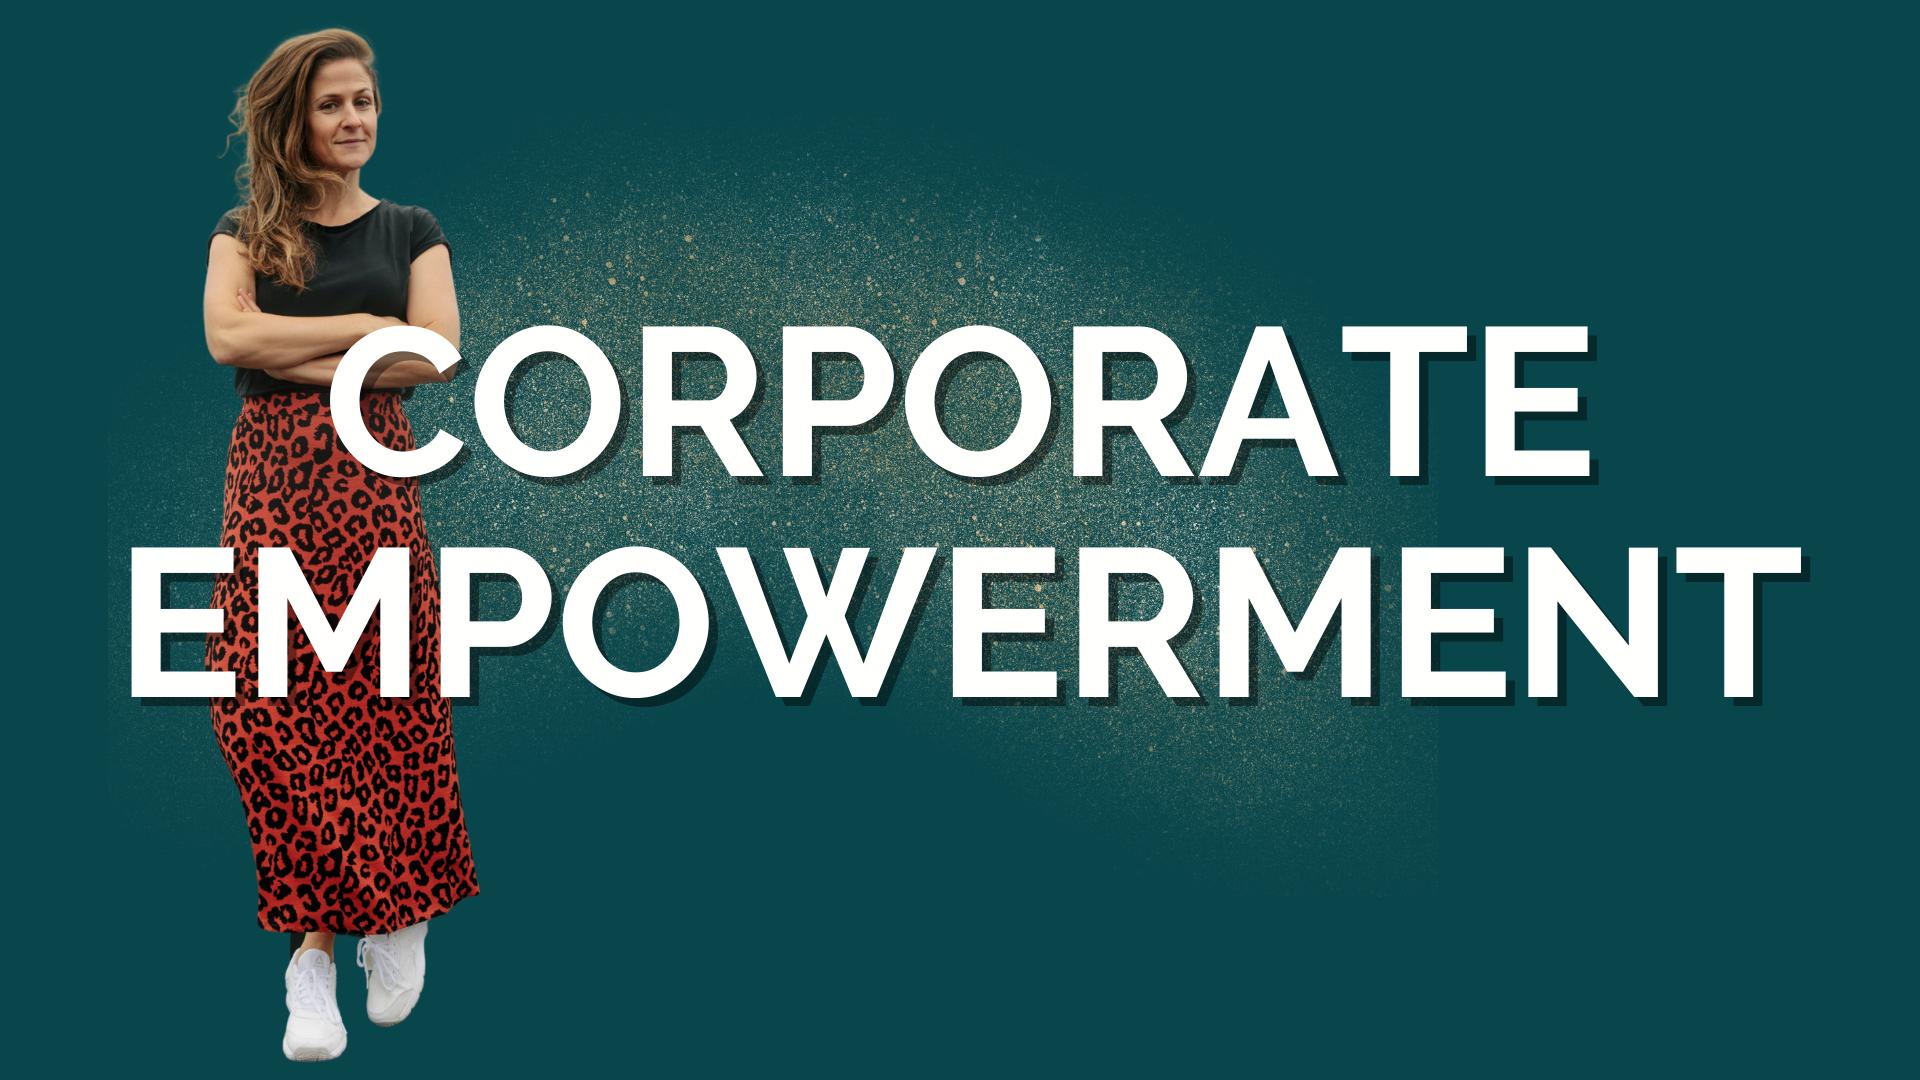 Corporate Mitarbeiter Coaching Speaker Workshops Self-Empowerment